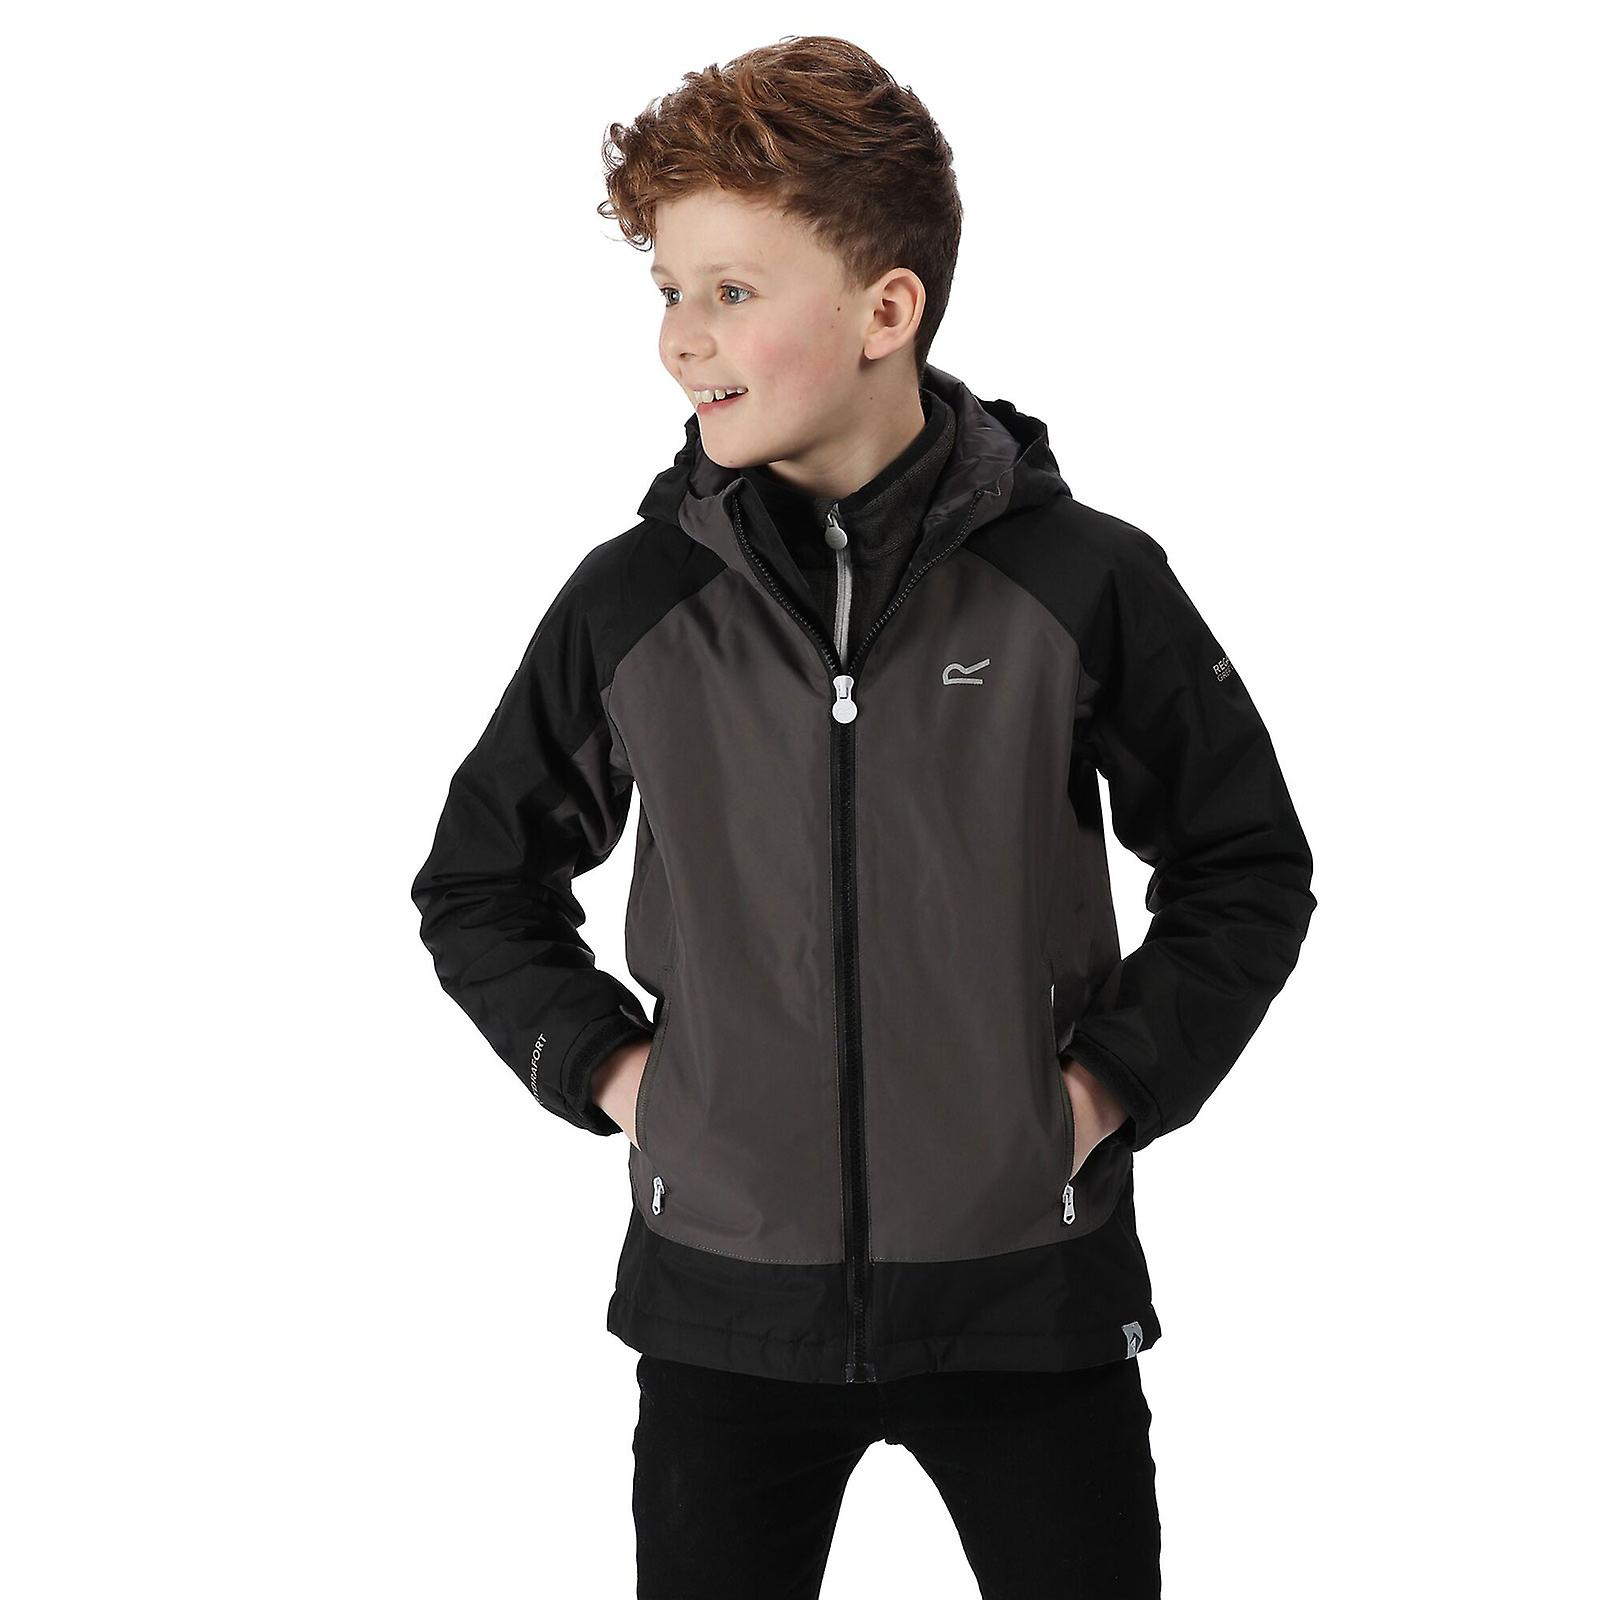 Regatta Hurdle III Kids Waterproof Insulated Jacket